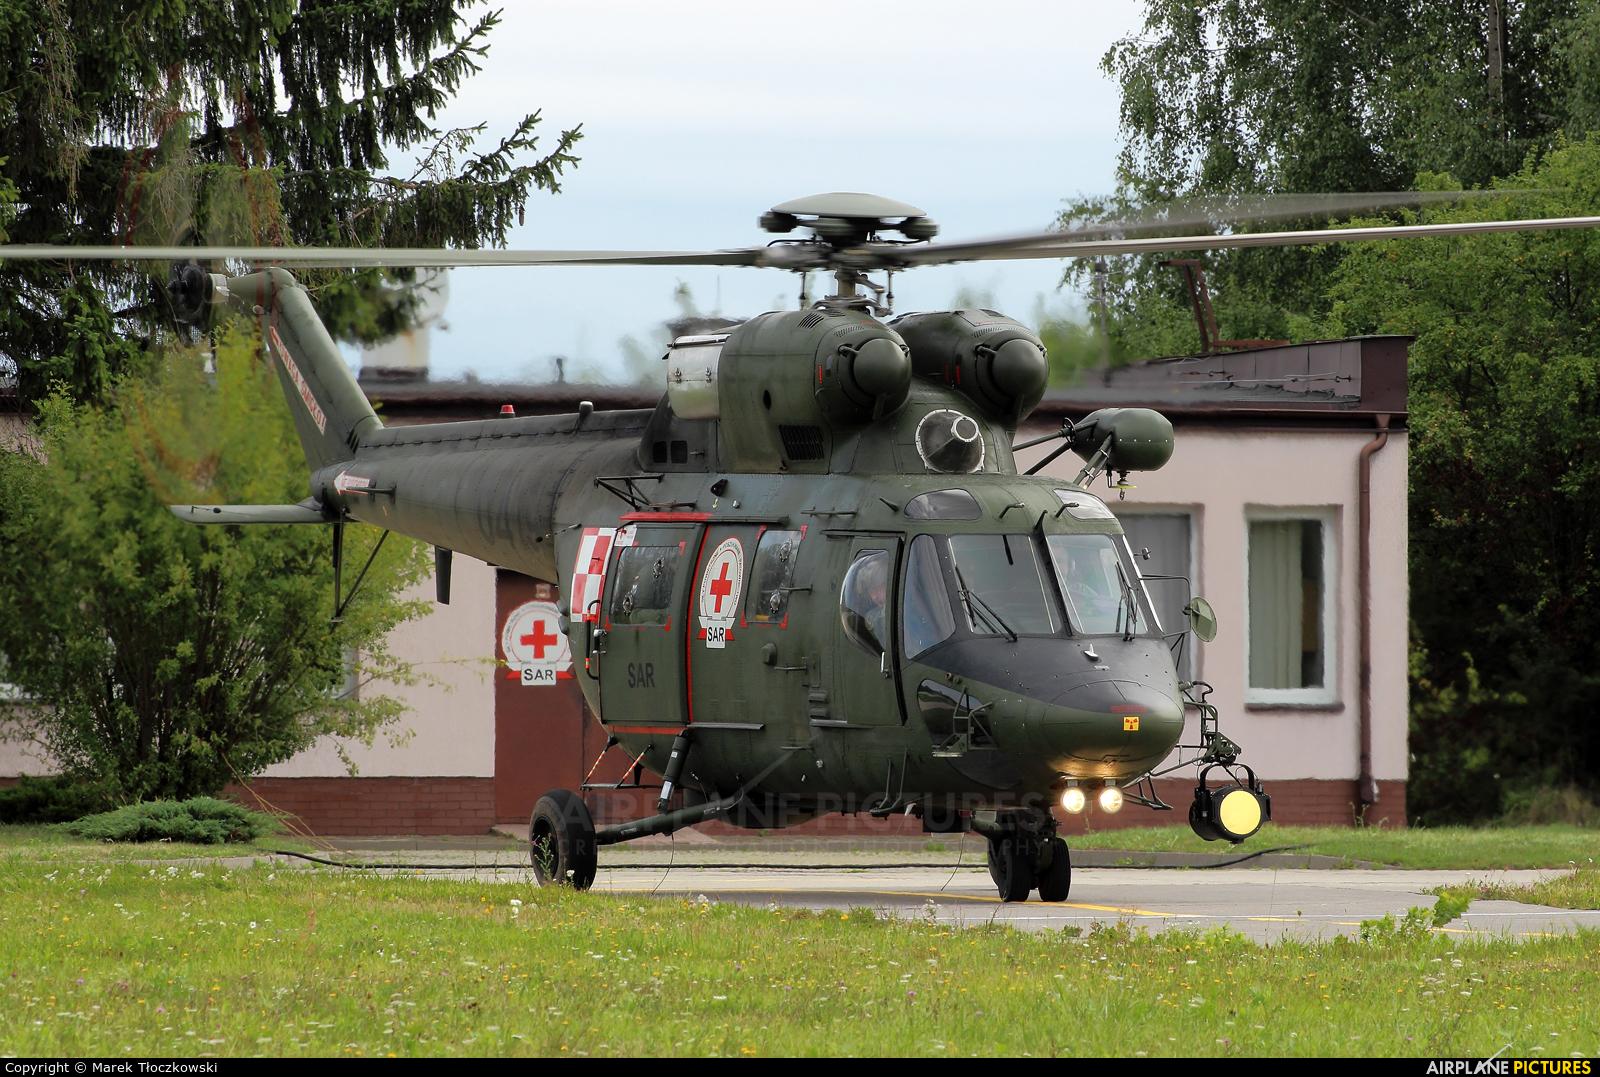 Poland - Air Force 0419 aircraft at Mińsk Mazowiecki